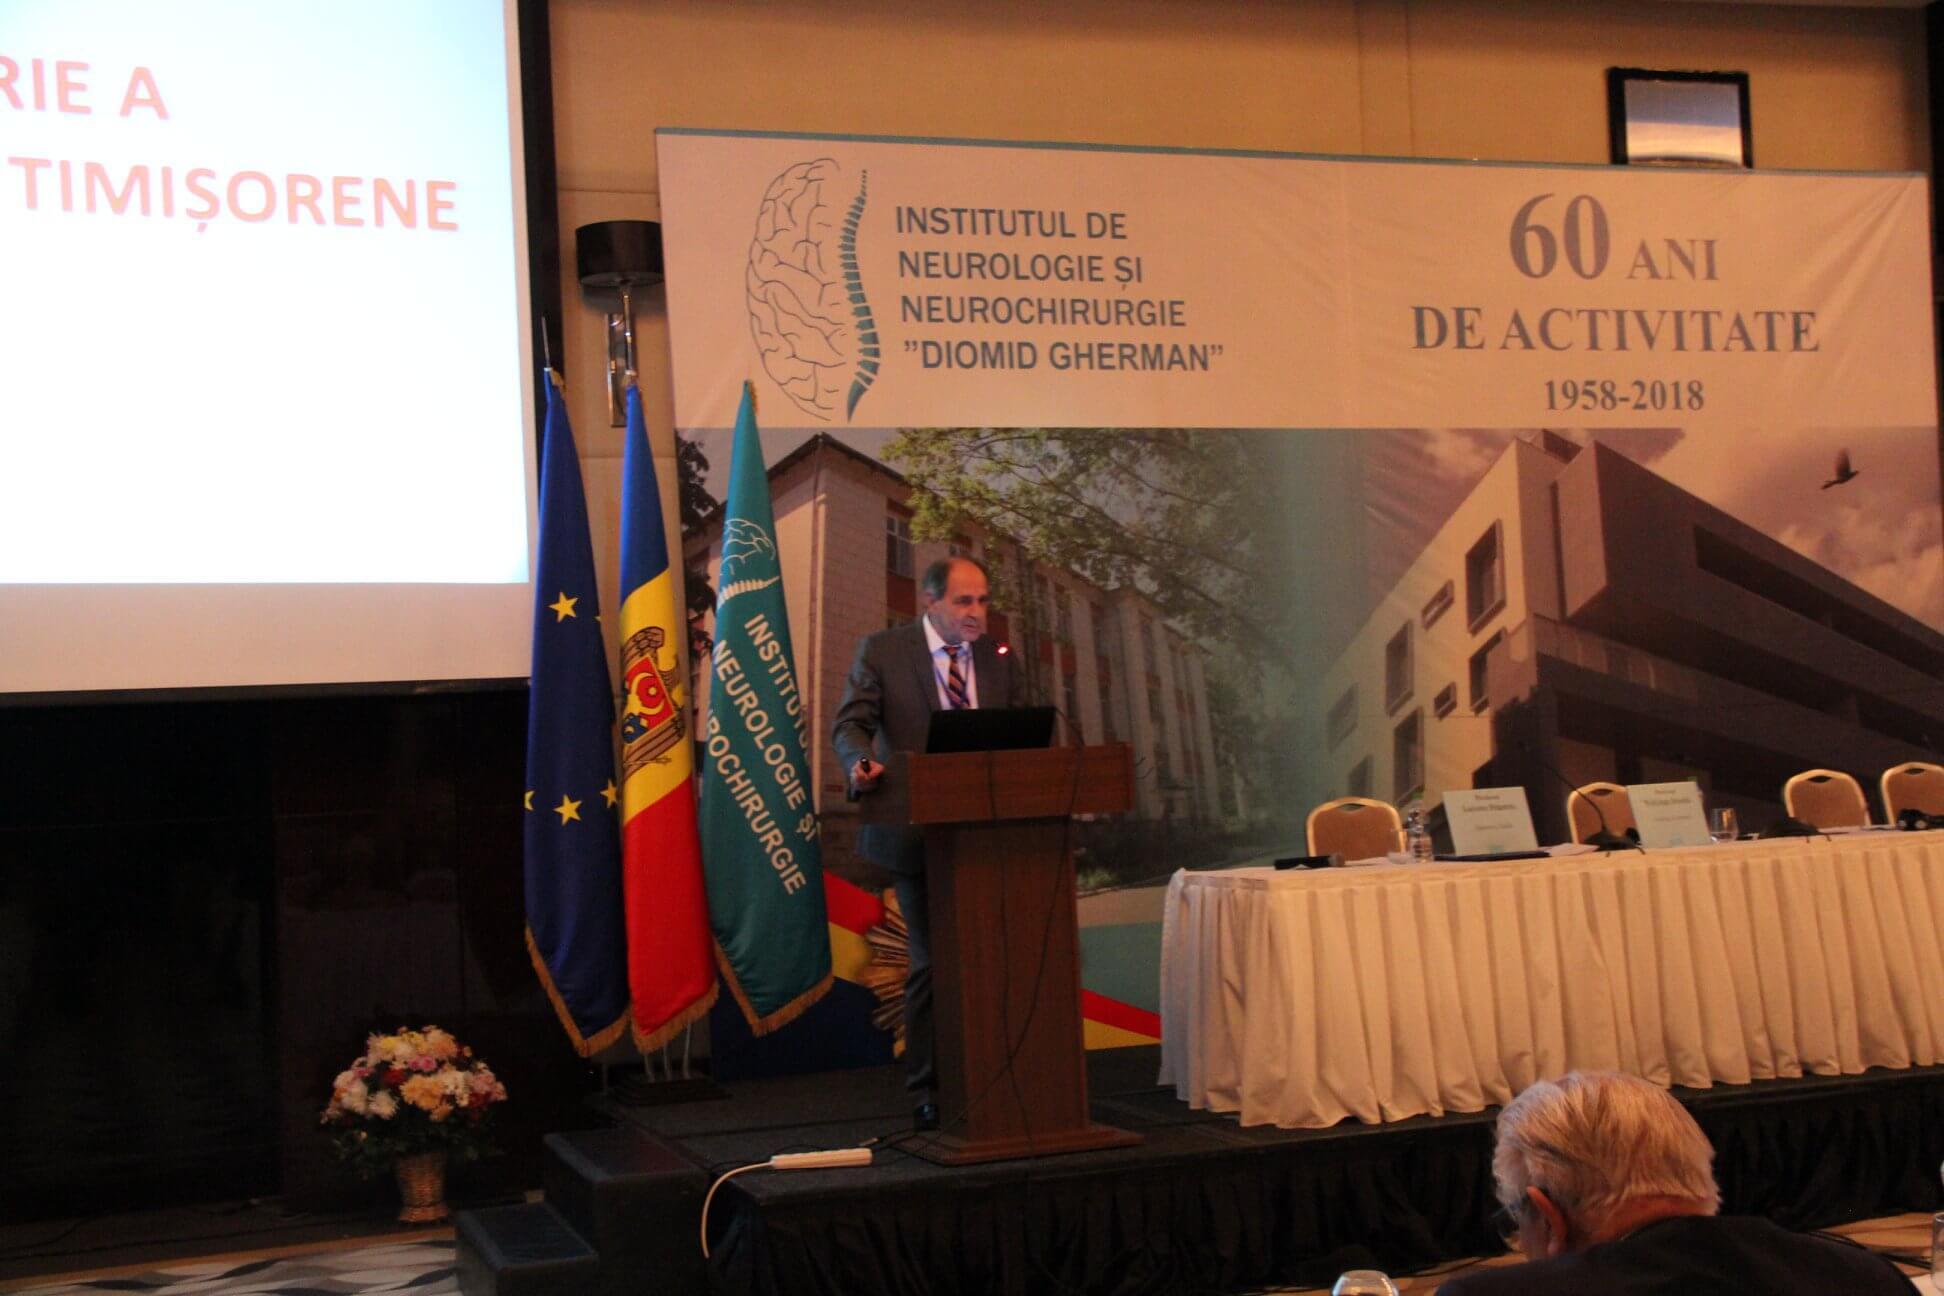 Institutul de Neurologie și Neurochirugie din Chișinău